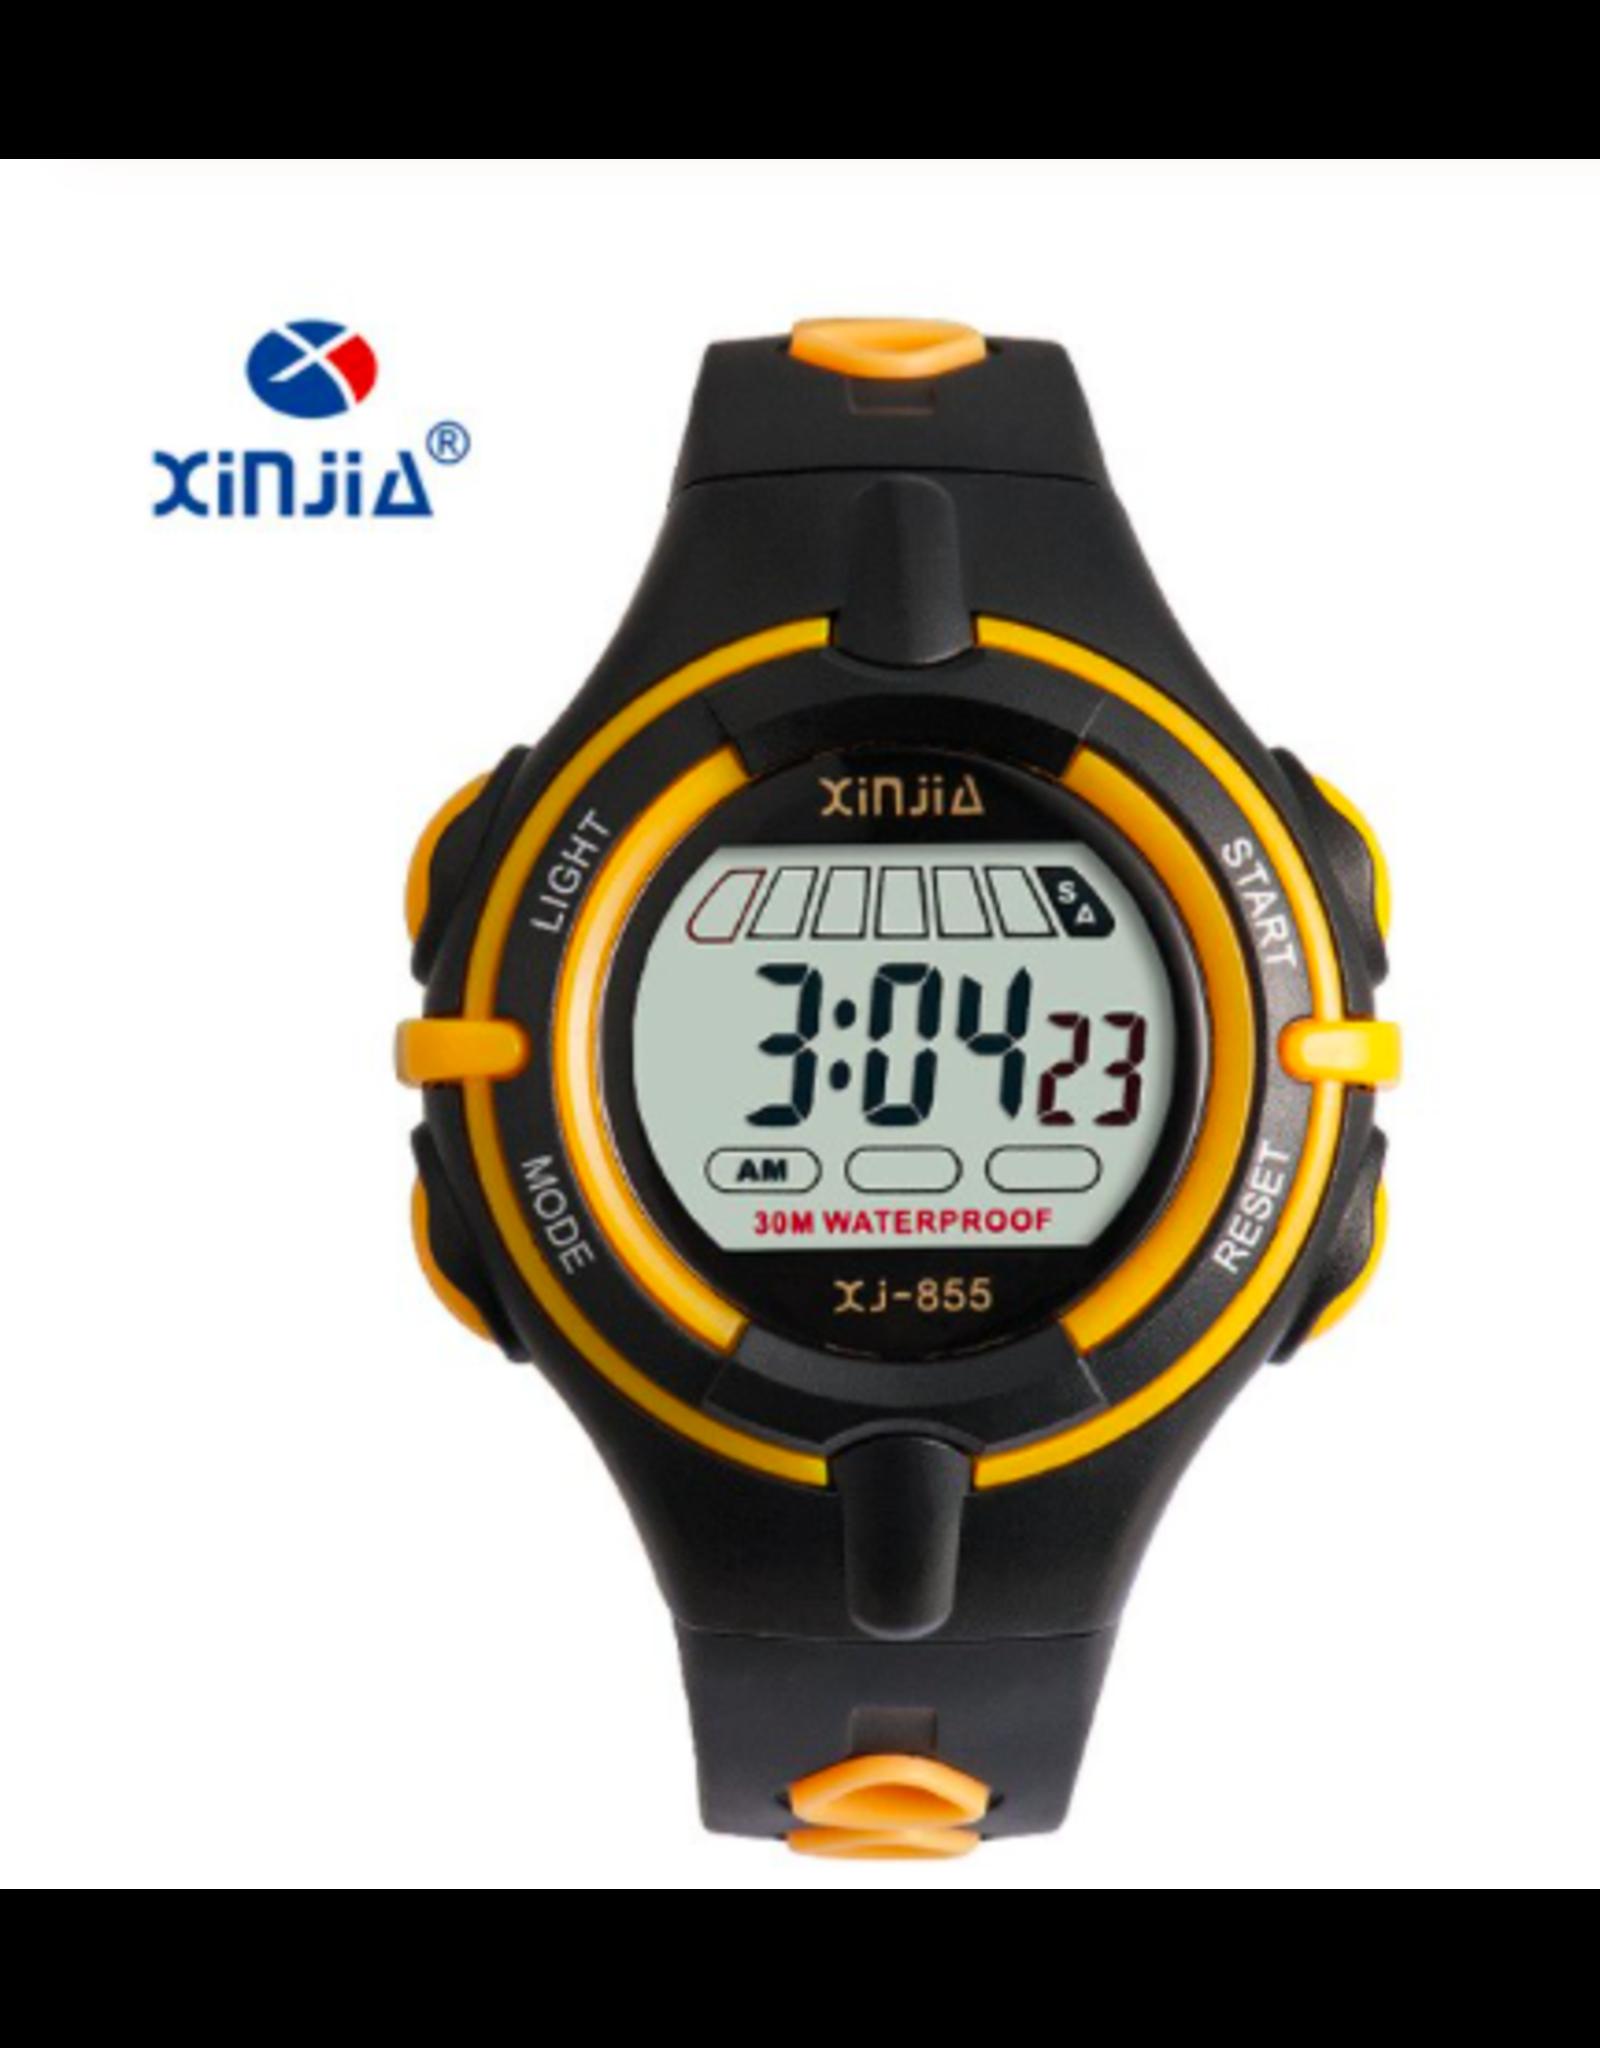 Xinjia Noir et jaune-3